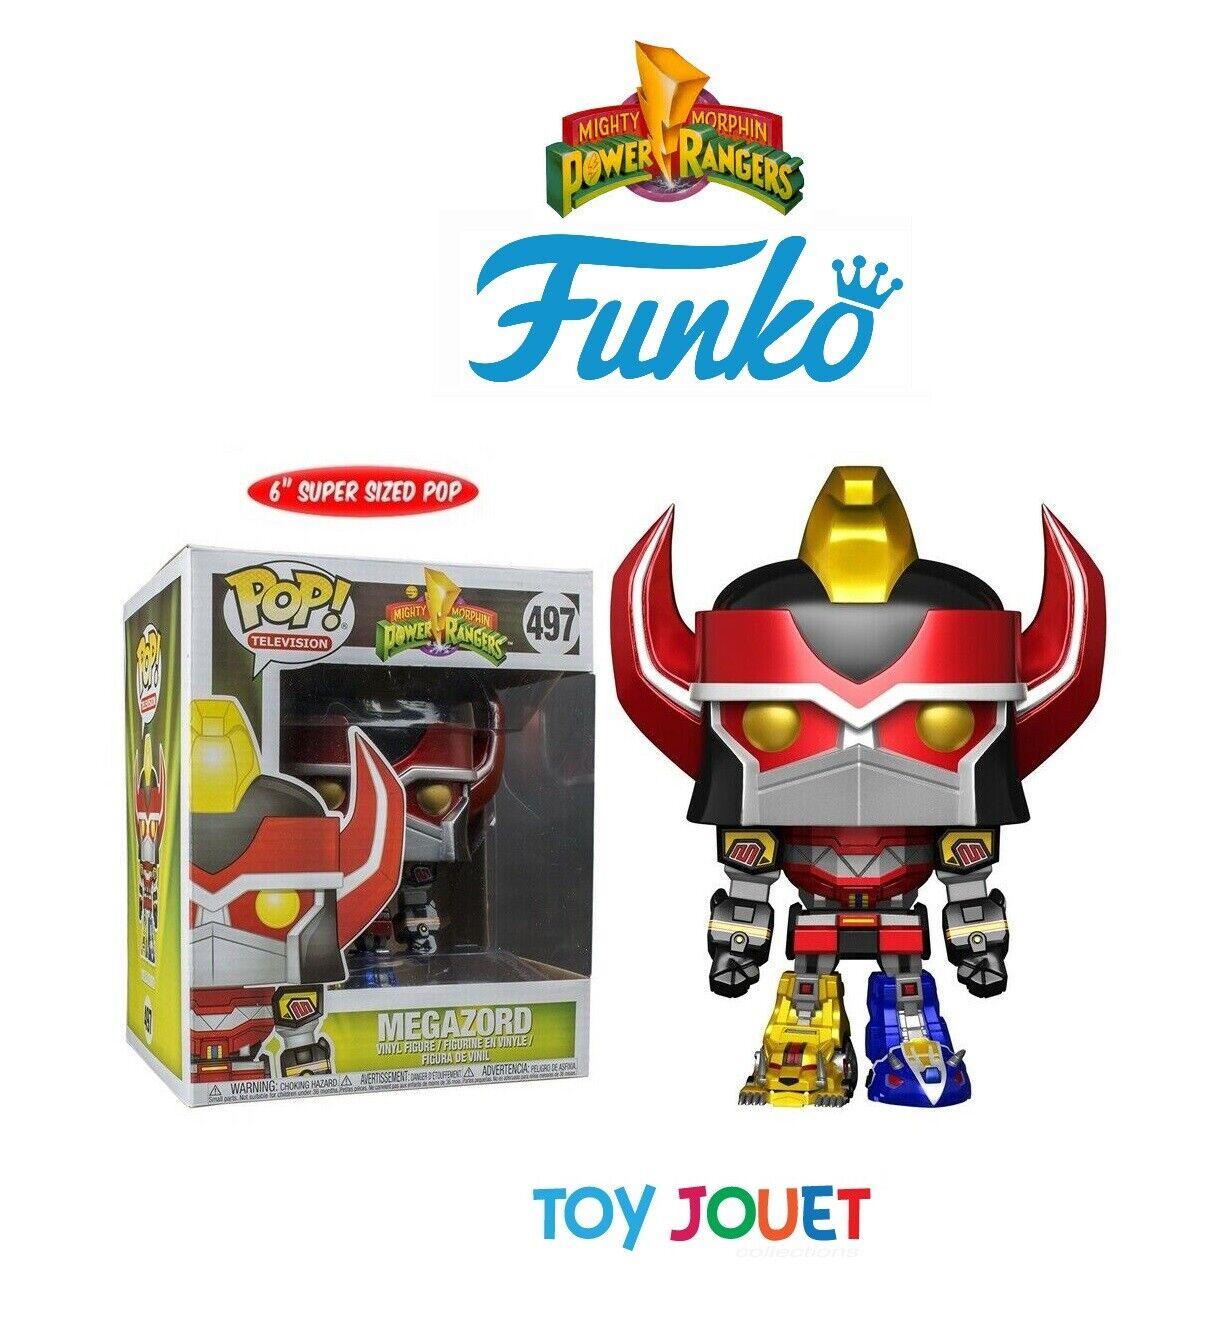 FUNKO POP GRAND 497 MEGAZORD METALLIC Power Rangers Mighty Morphin